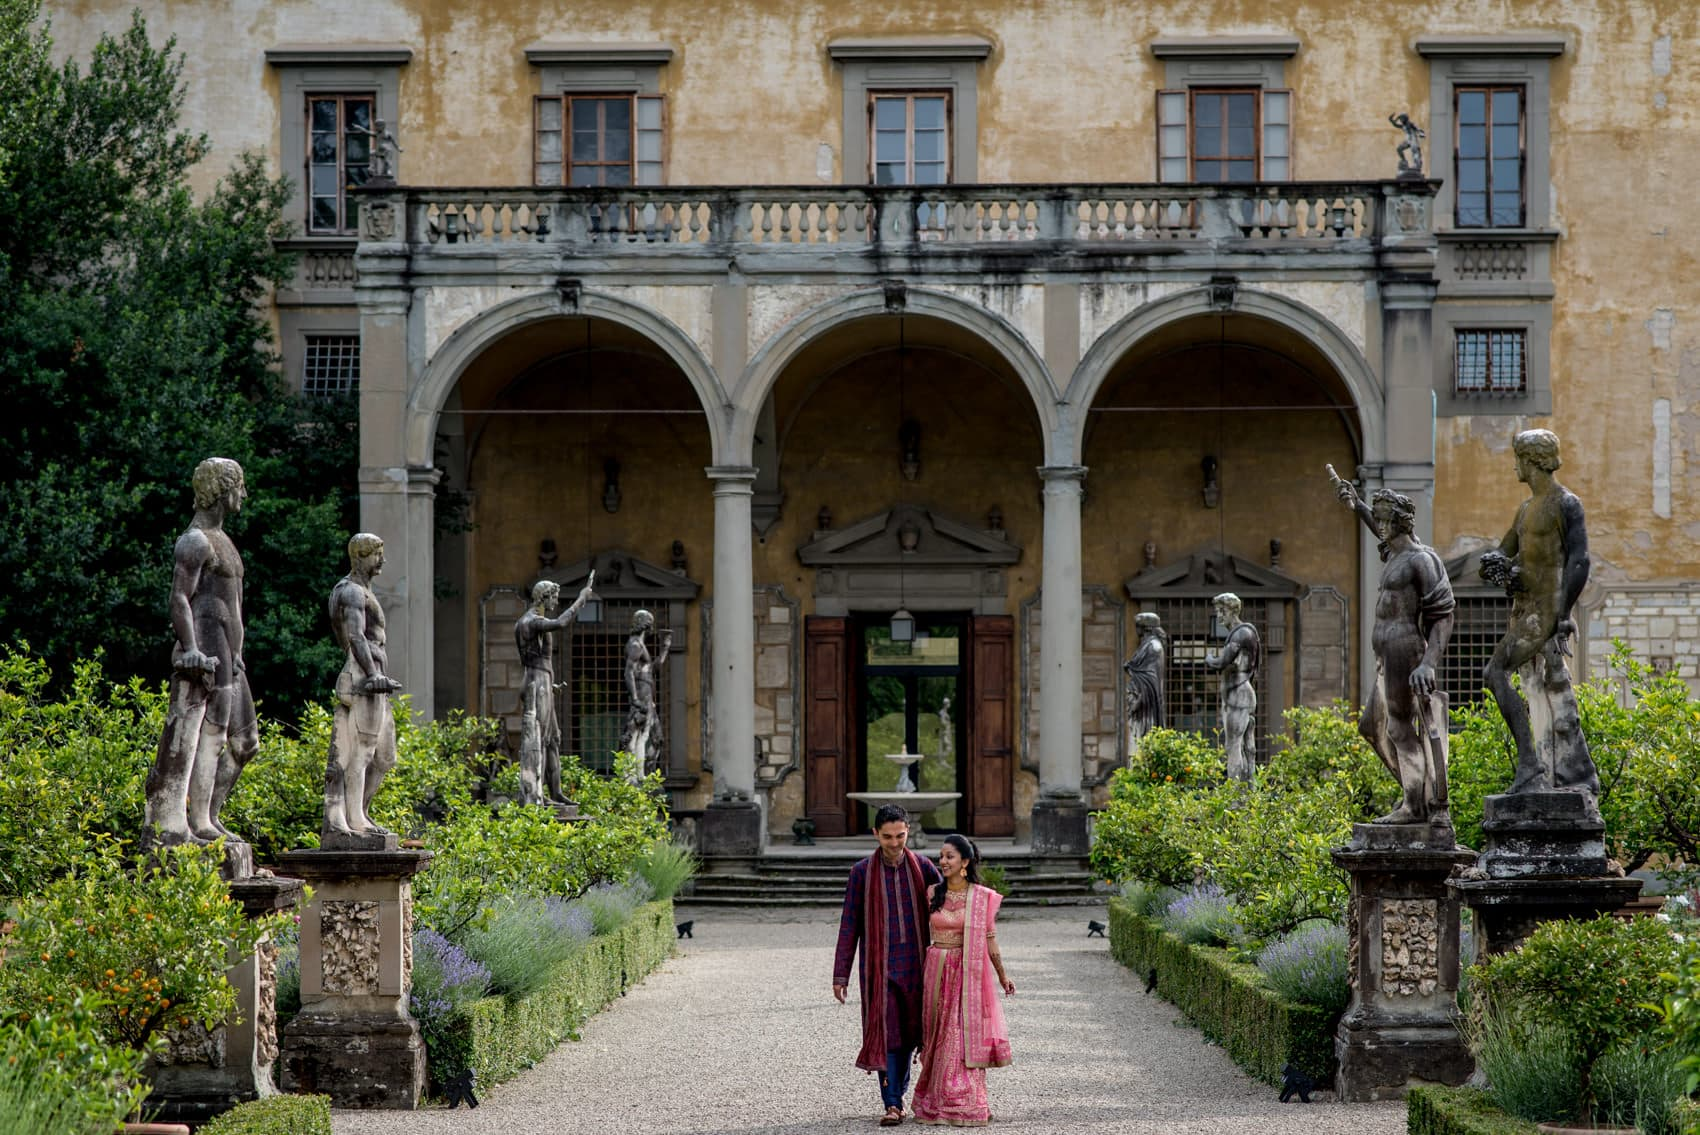 Florence wedding at Giardino Corsini al Prato